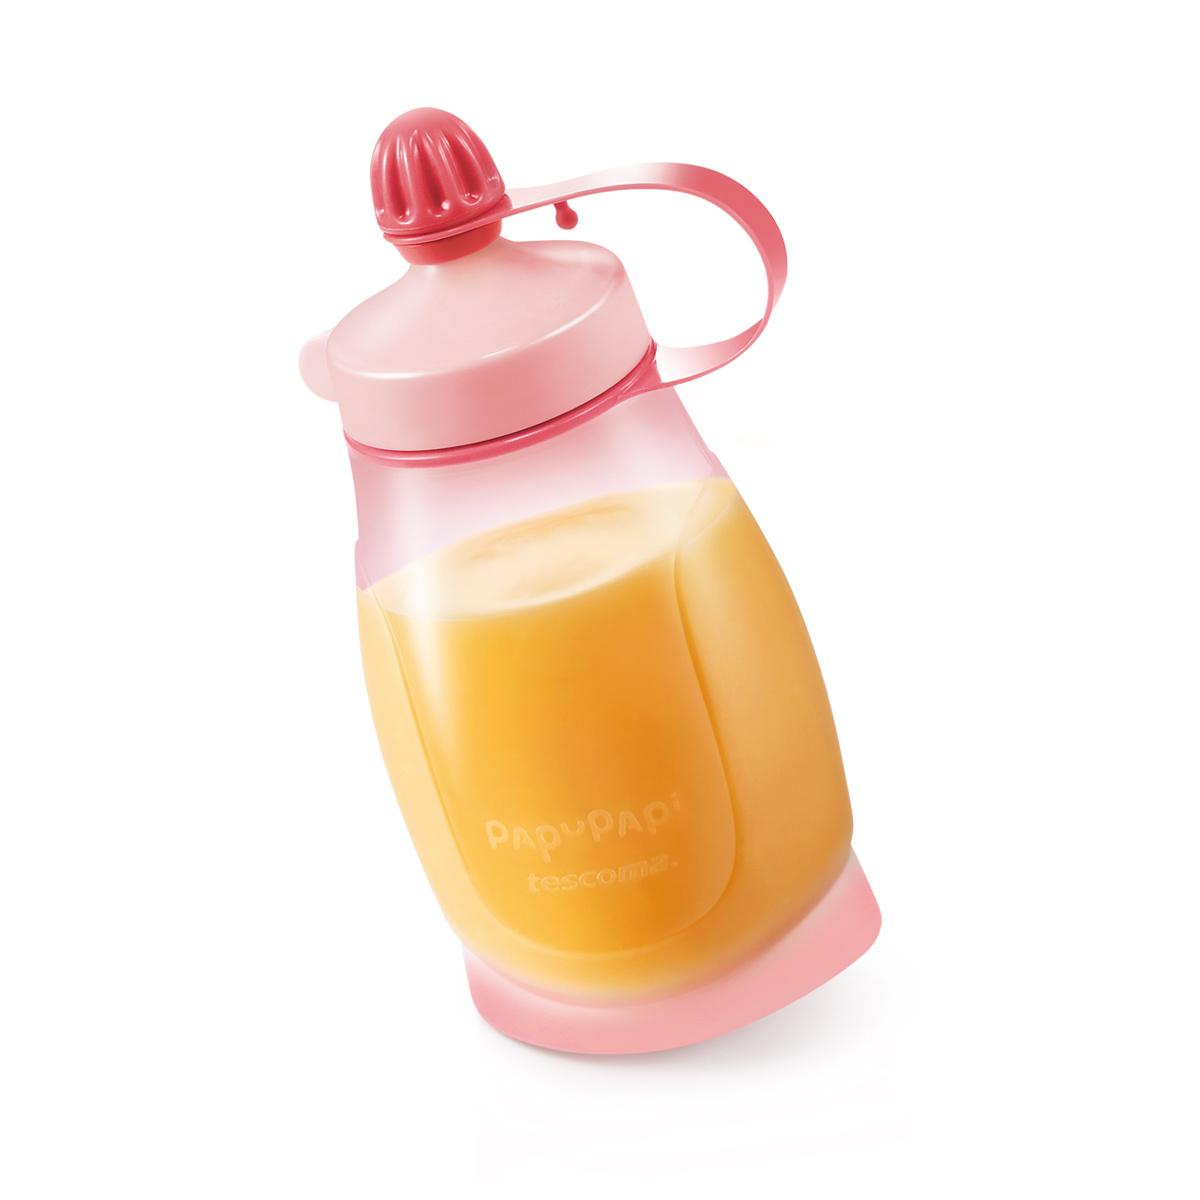 TESCOMA pružná láhev PAPU PAPI 200 ml, se lžičkou, růžová